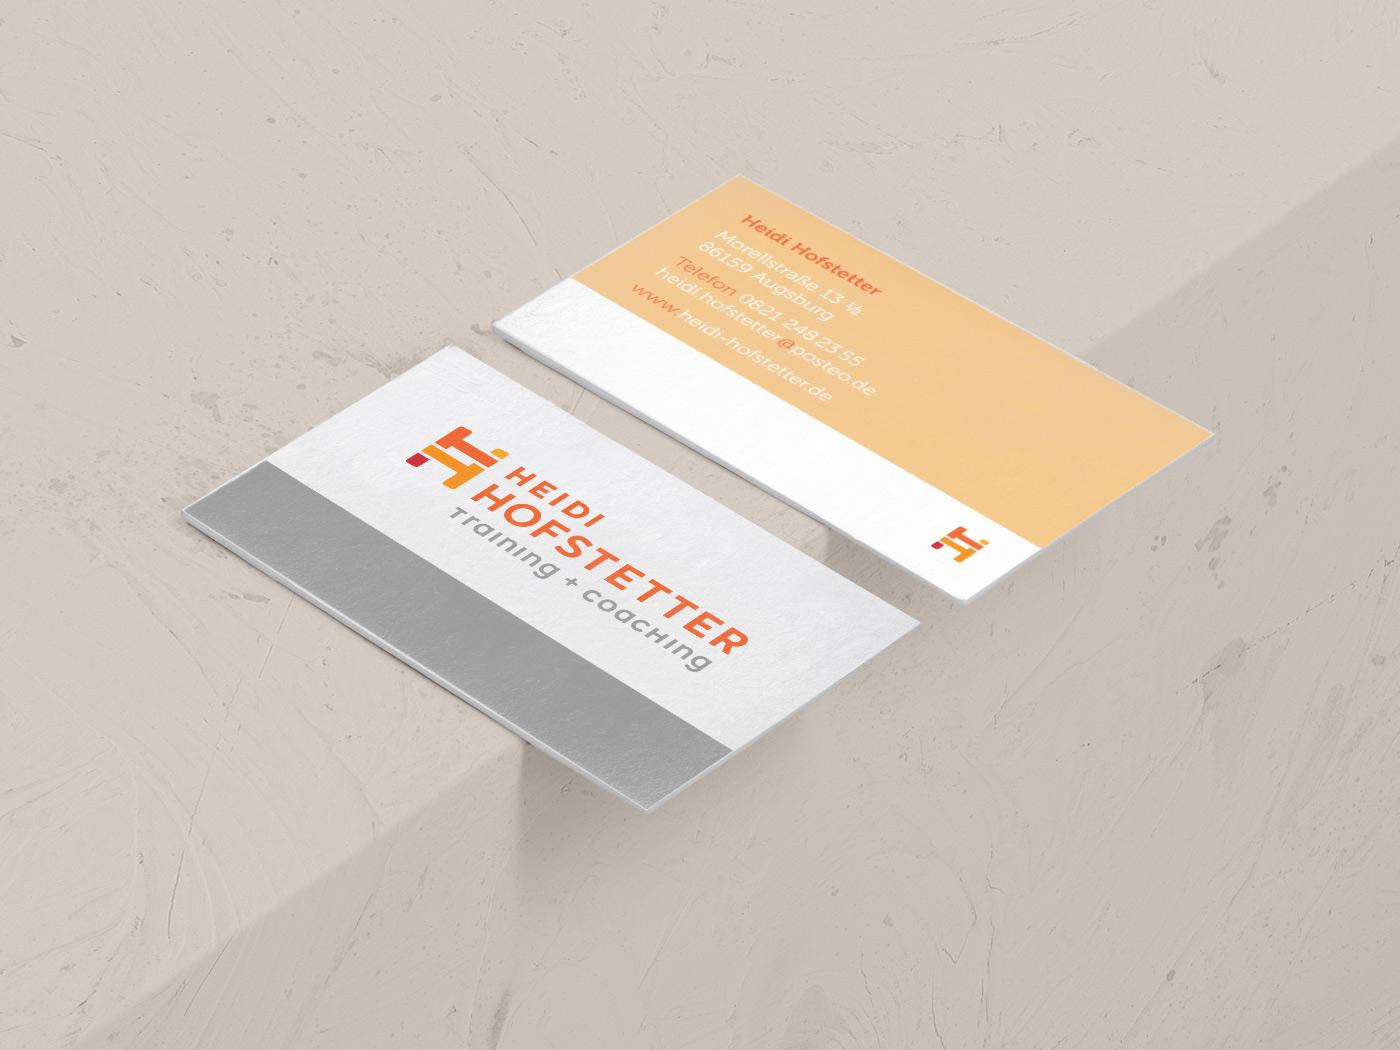 hofstetter_visitenkarte_grafik_design_marina_grimme_augsburg